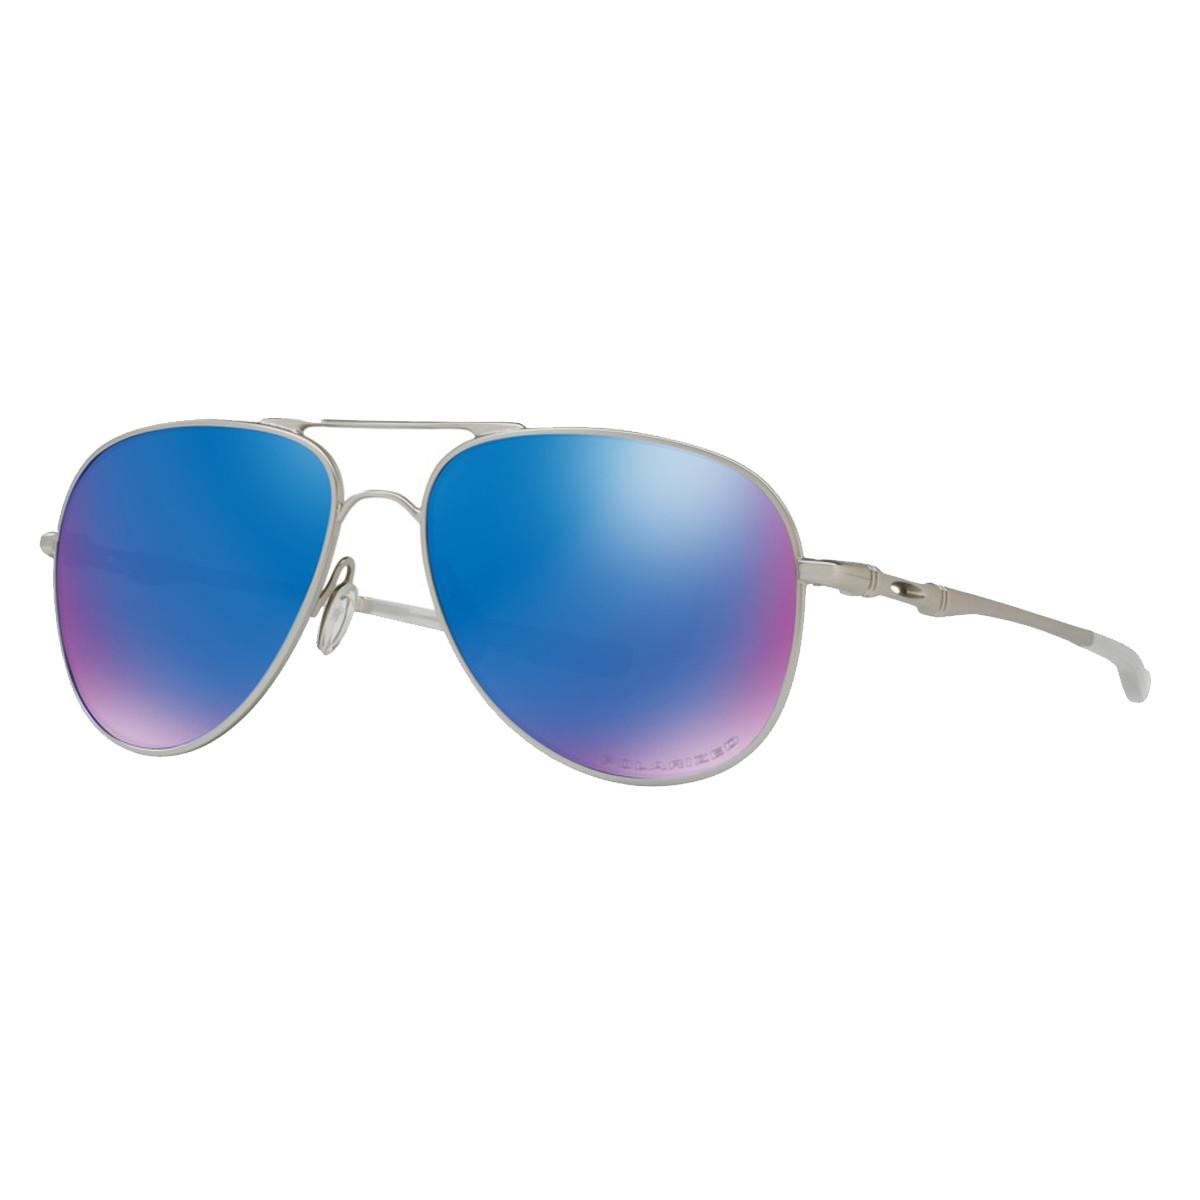 Óculos Oakley Elmont L Satin Chrome  Lente Saphire Iridium Polarizado be2d4ad7fe